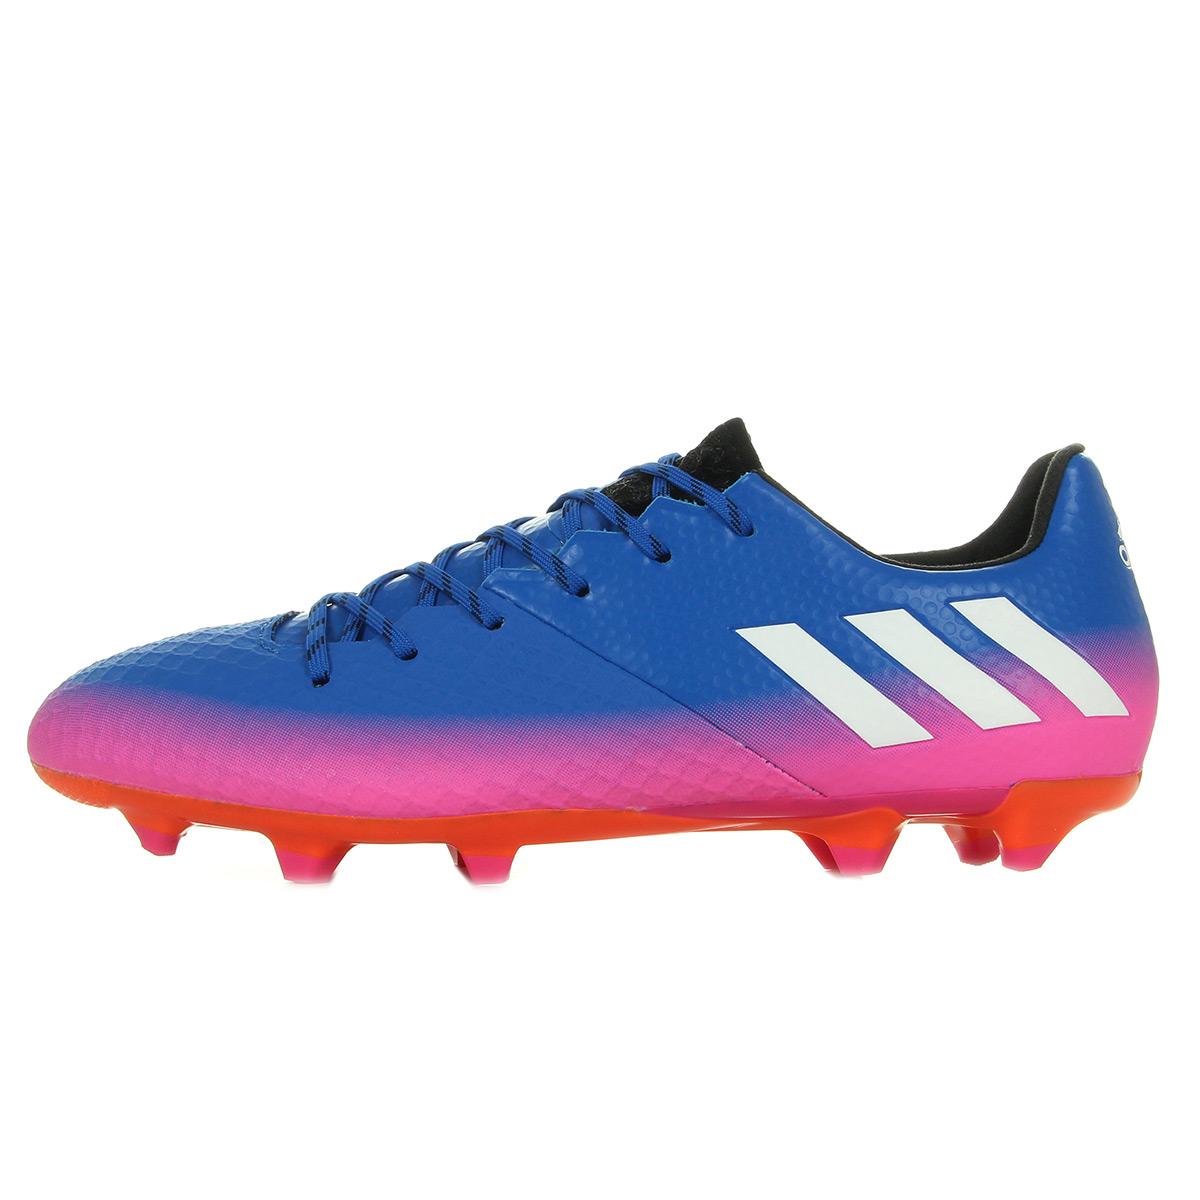 Adidas 162 Le Fournisseur Fg Football Plus Messi Ba9145 Homme Grand rwxqCrU5